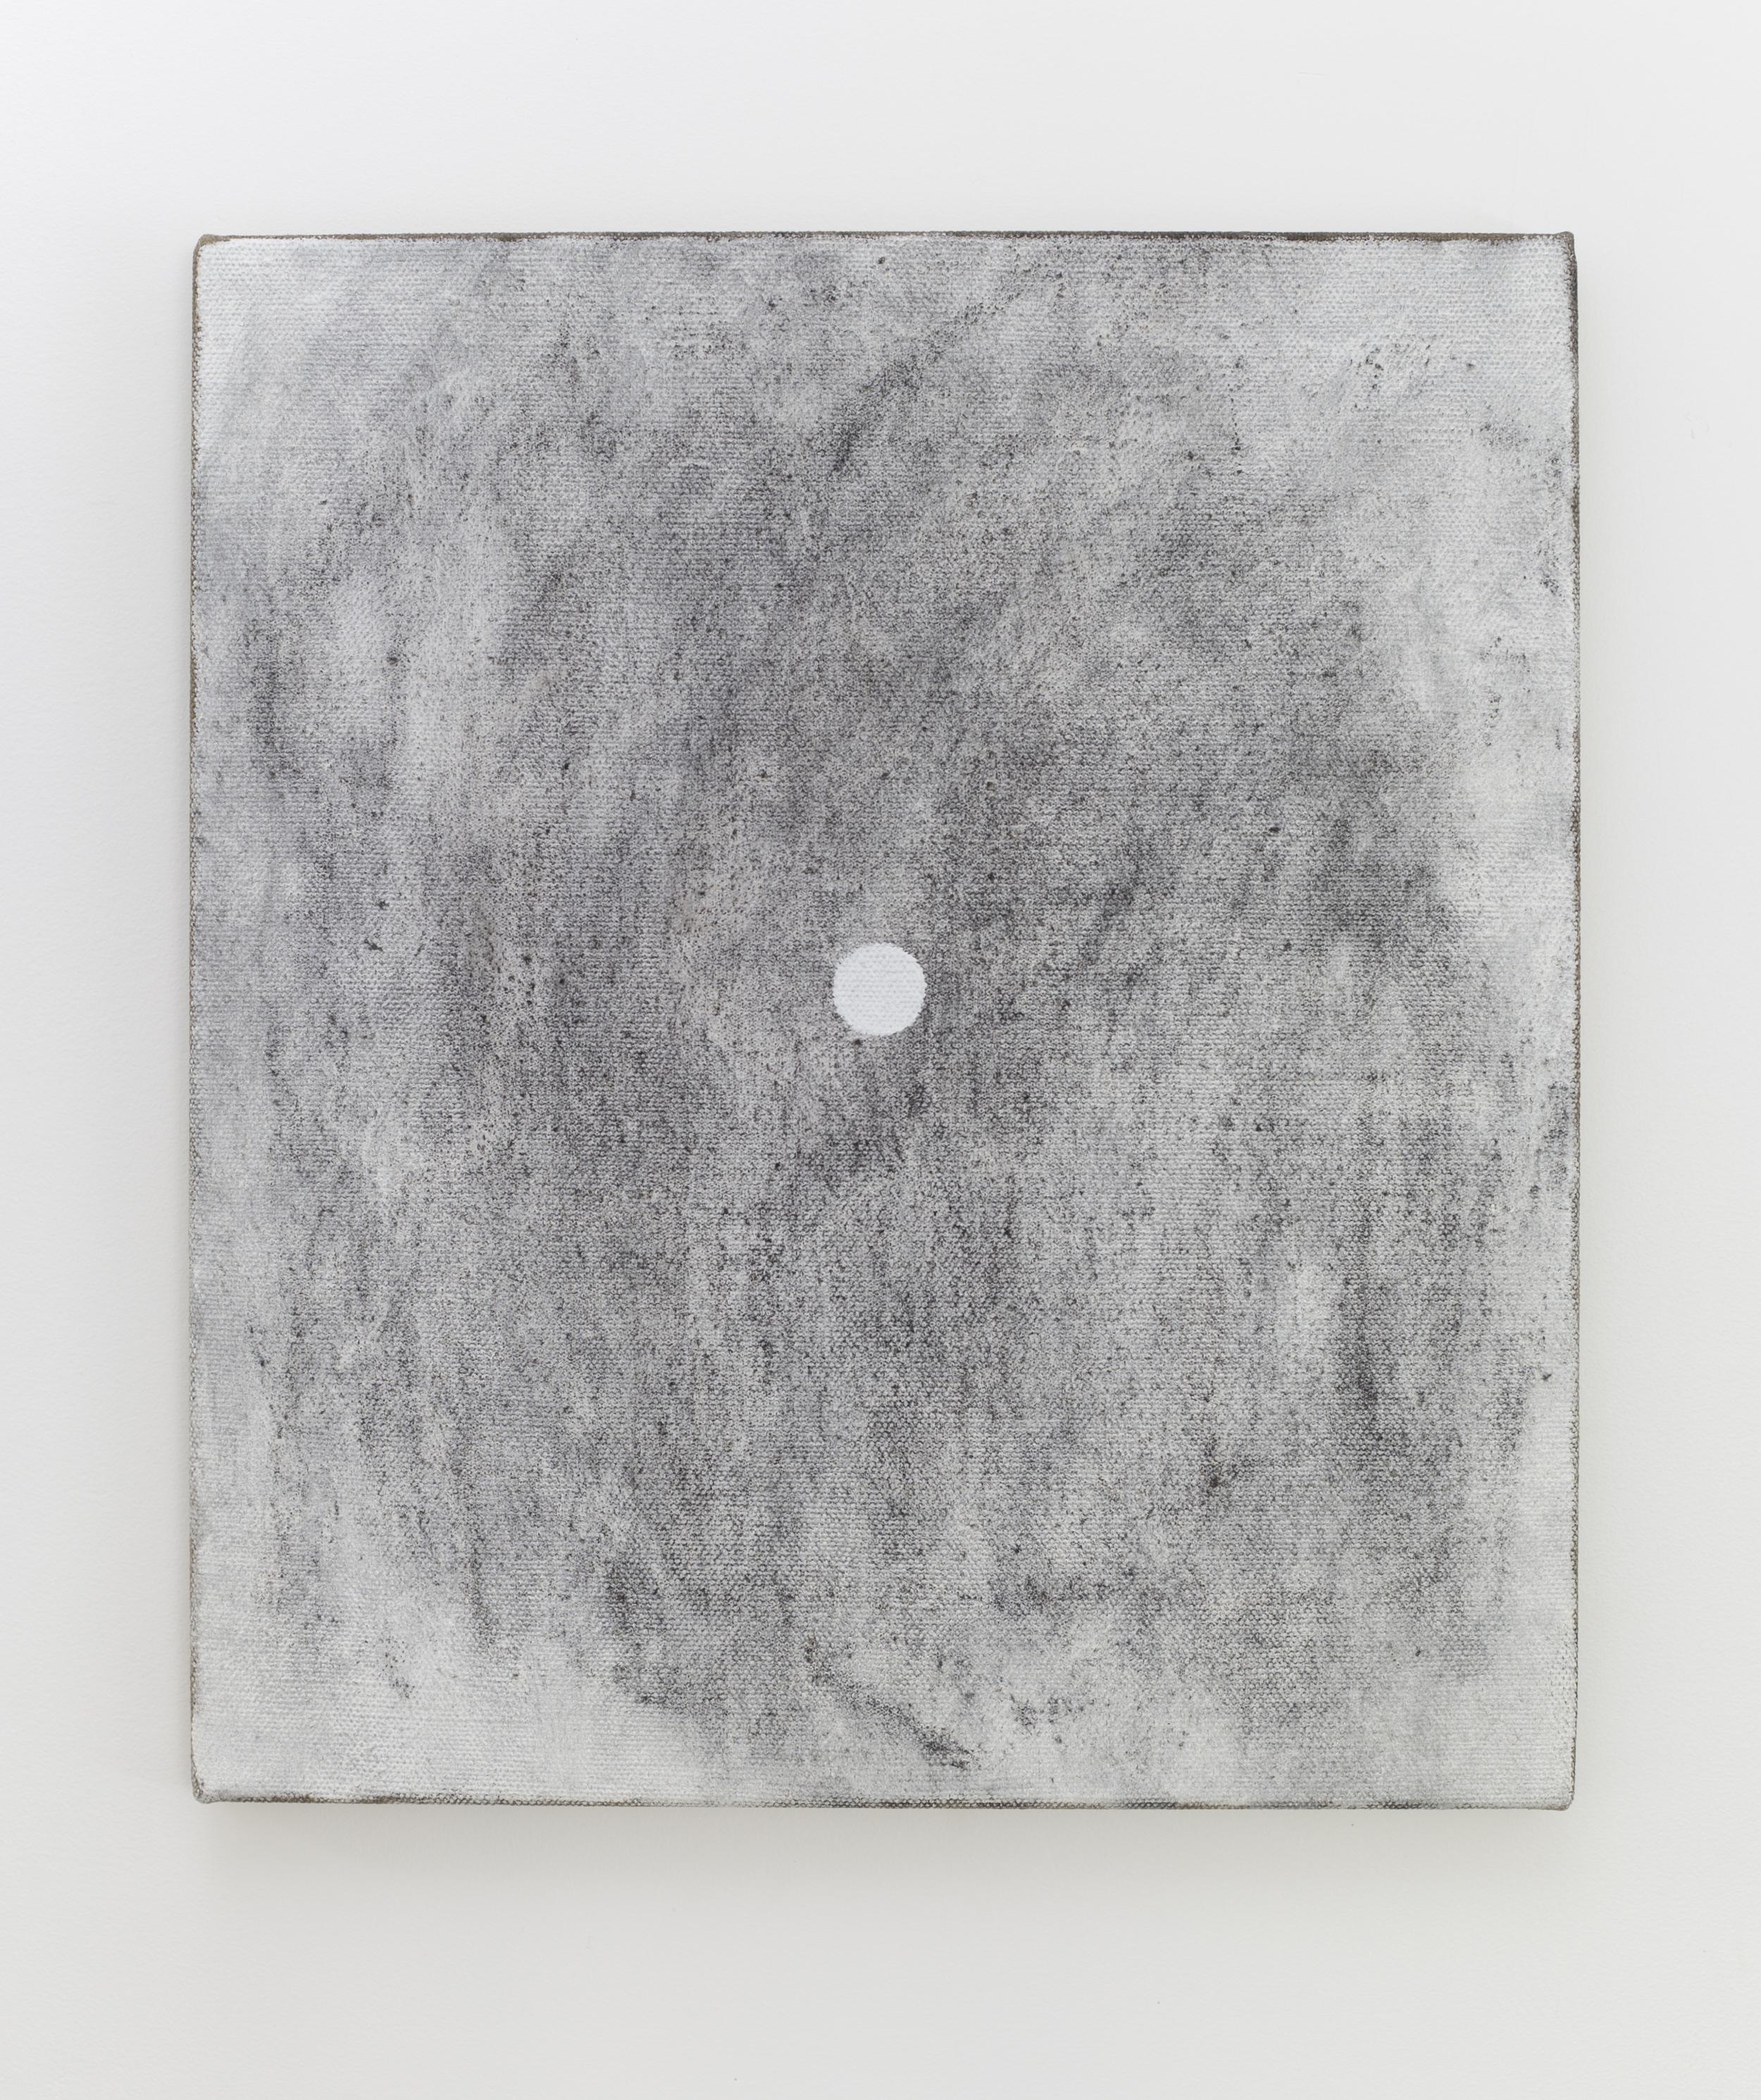 Eleanor Louise Butt, Untitled (burnt log rubbing), 2016. Oil and burnt log charcoal on Belgian linen 46cm x 41.5cm